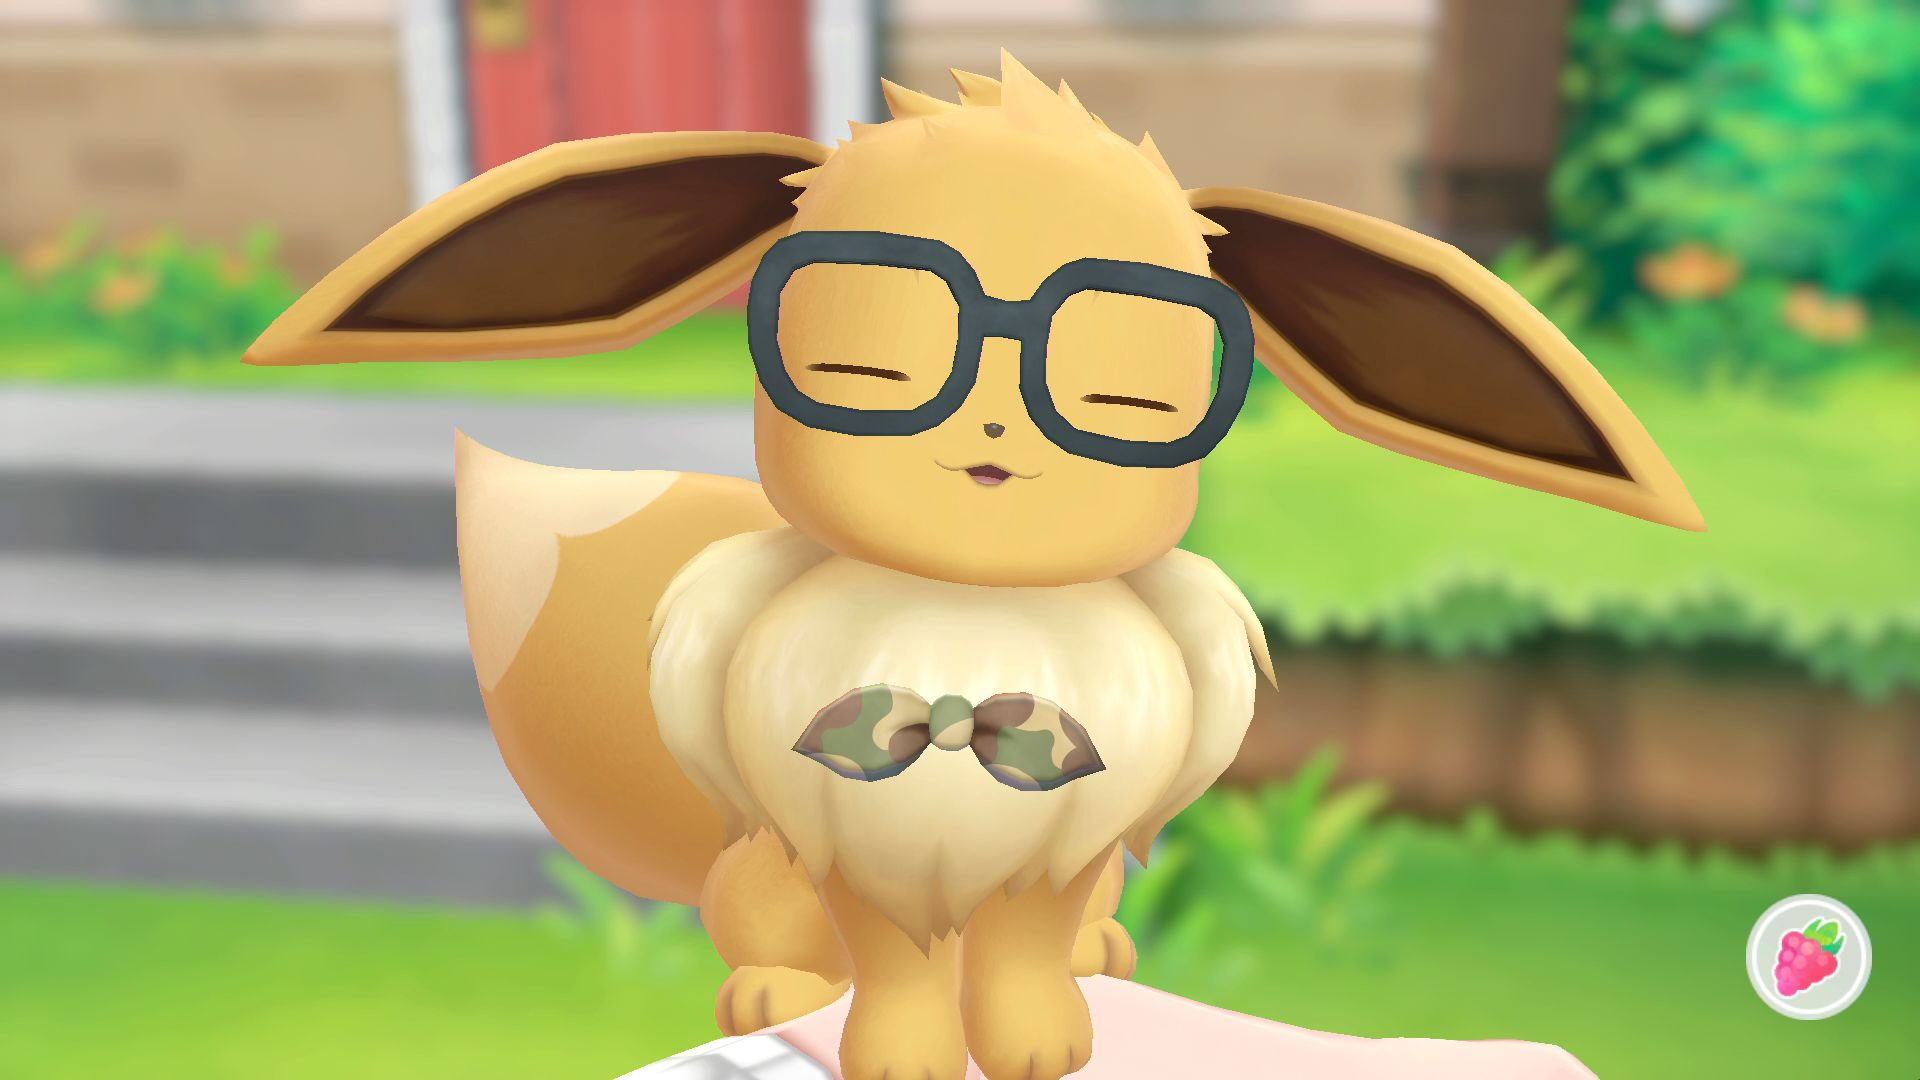 Nintendo Switch eShop has a stellar week, from Pokémon to Civ 6